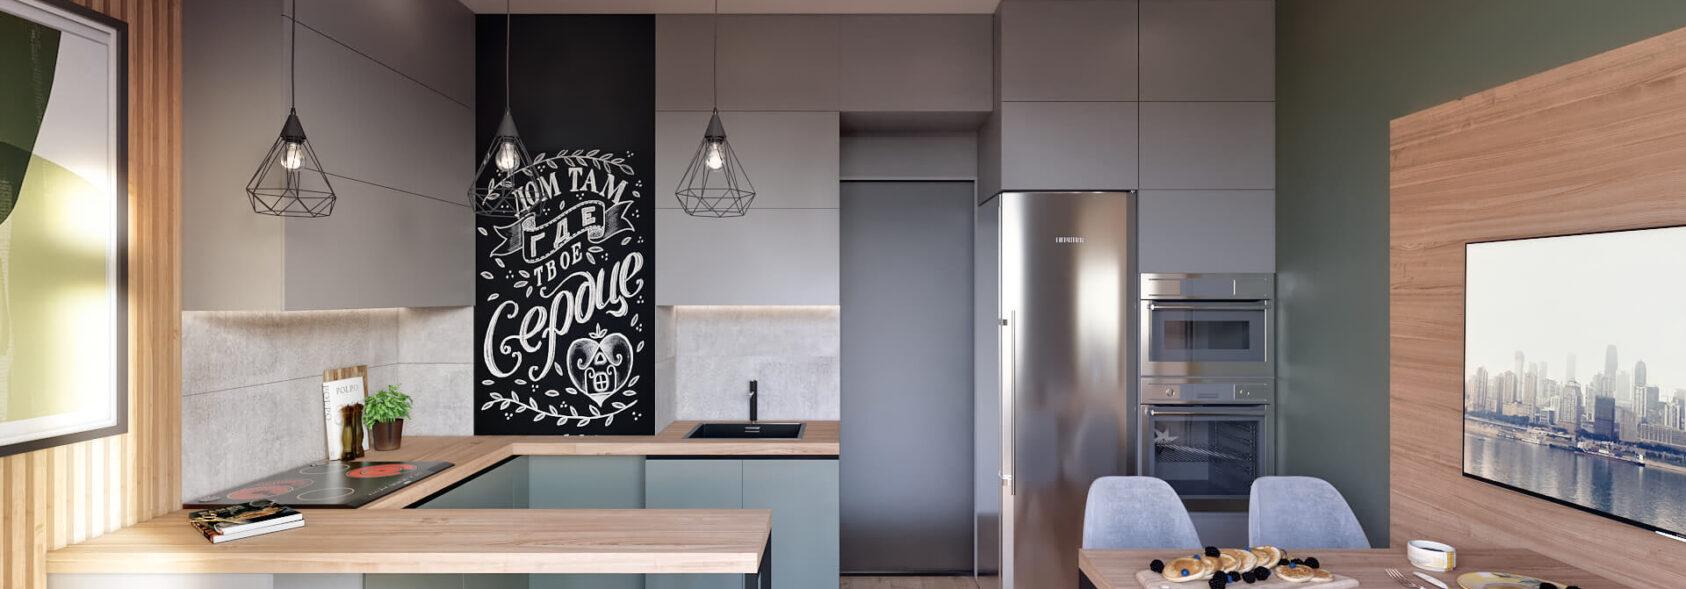 Дизайн 3-х комнатной квартиры Киев гостиная кухня